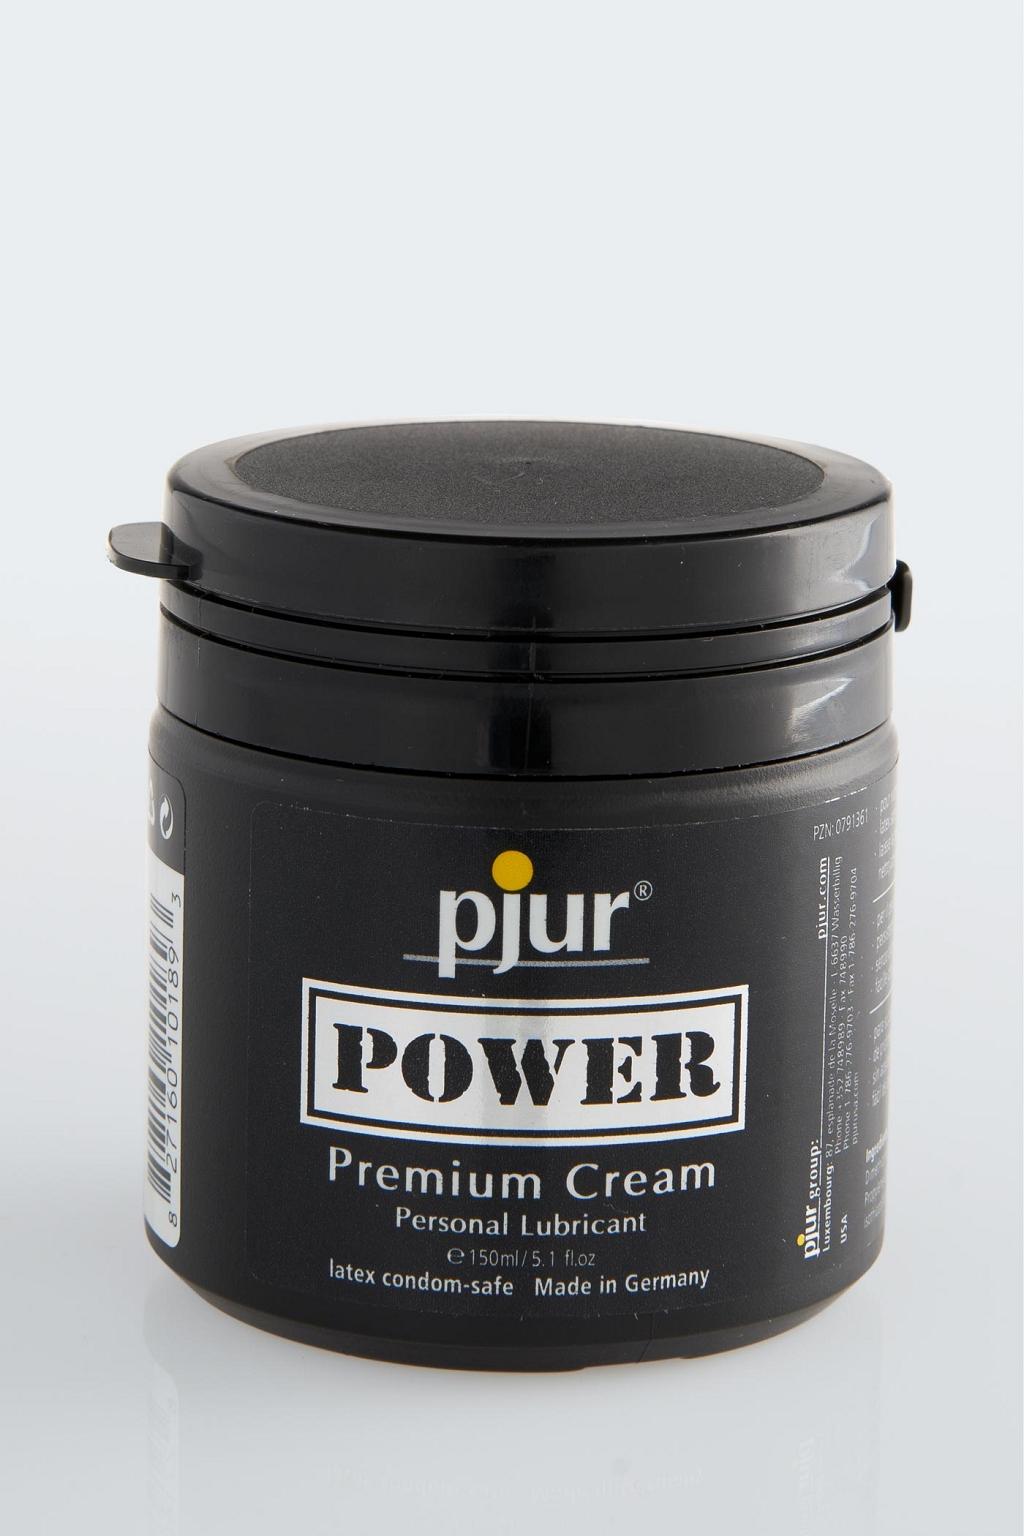 Premium Crème Power Ml Pjur 500-83227